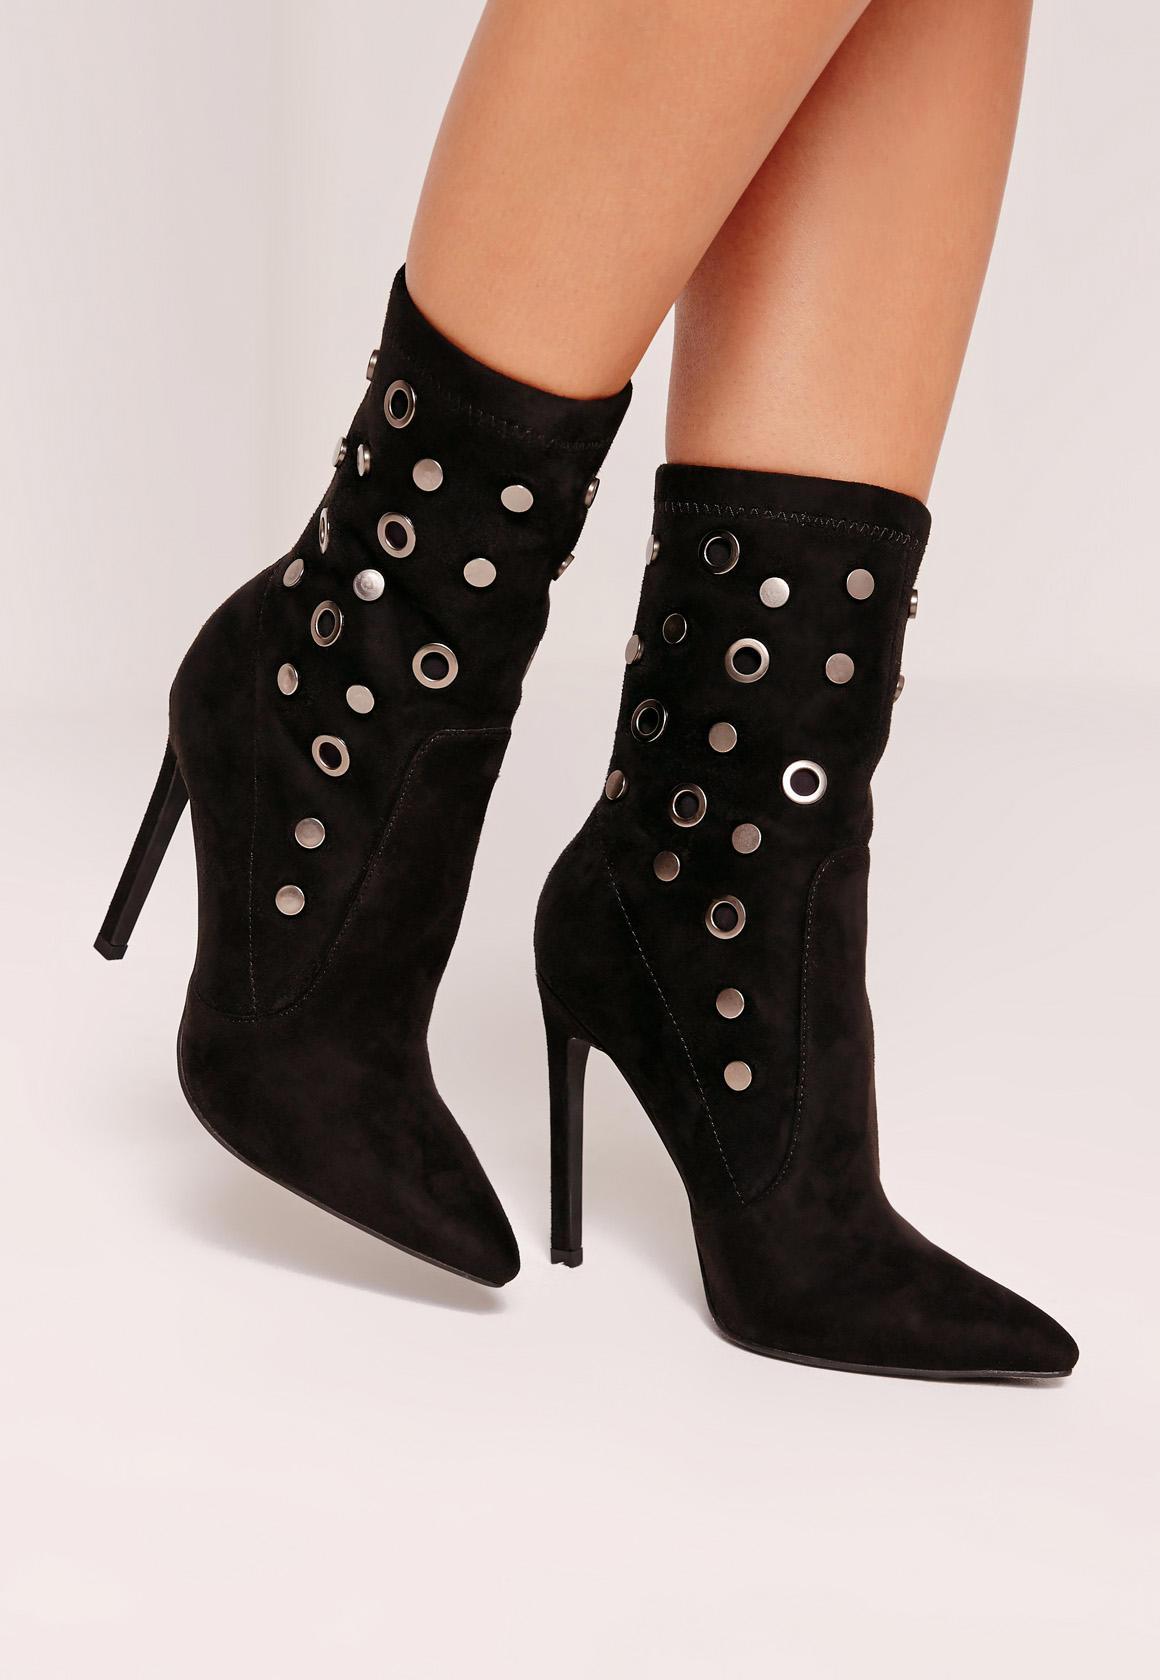 Eyelet Stud Sock Ankle Boot Black